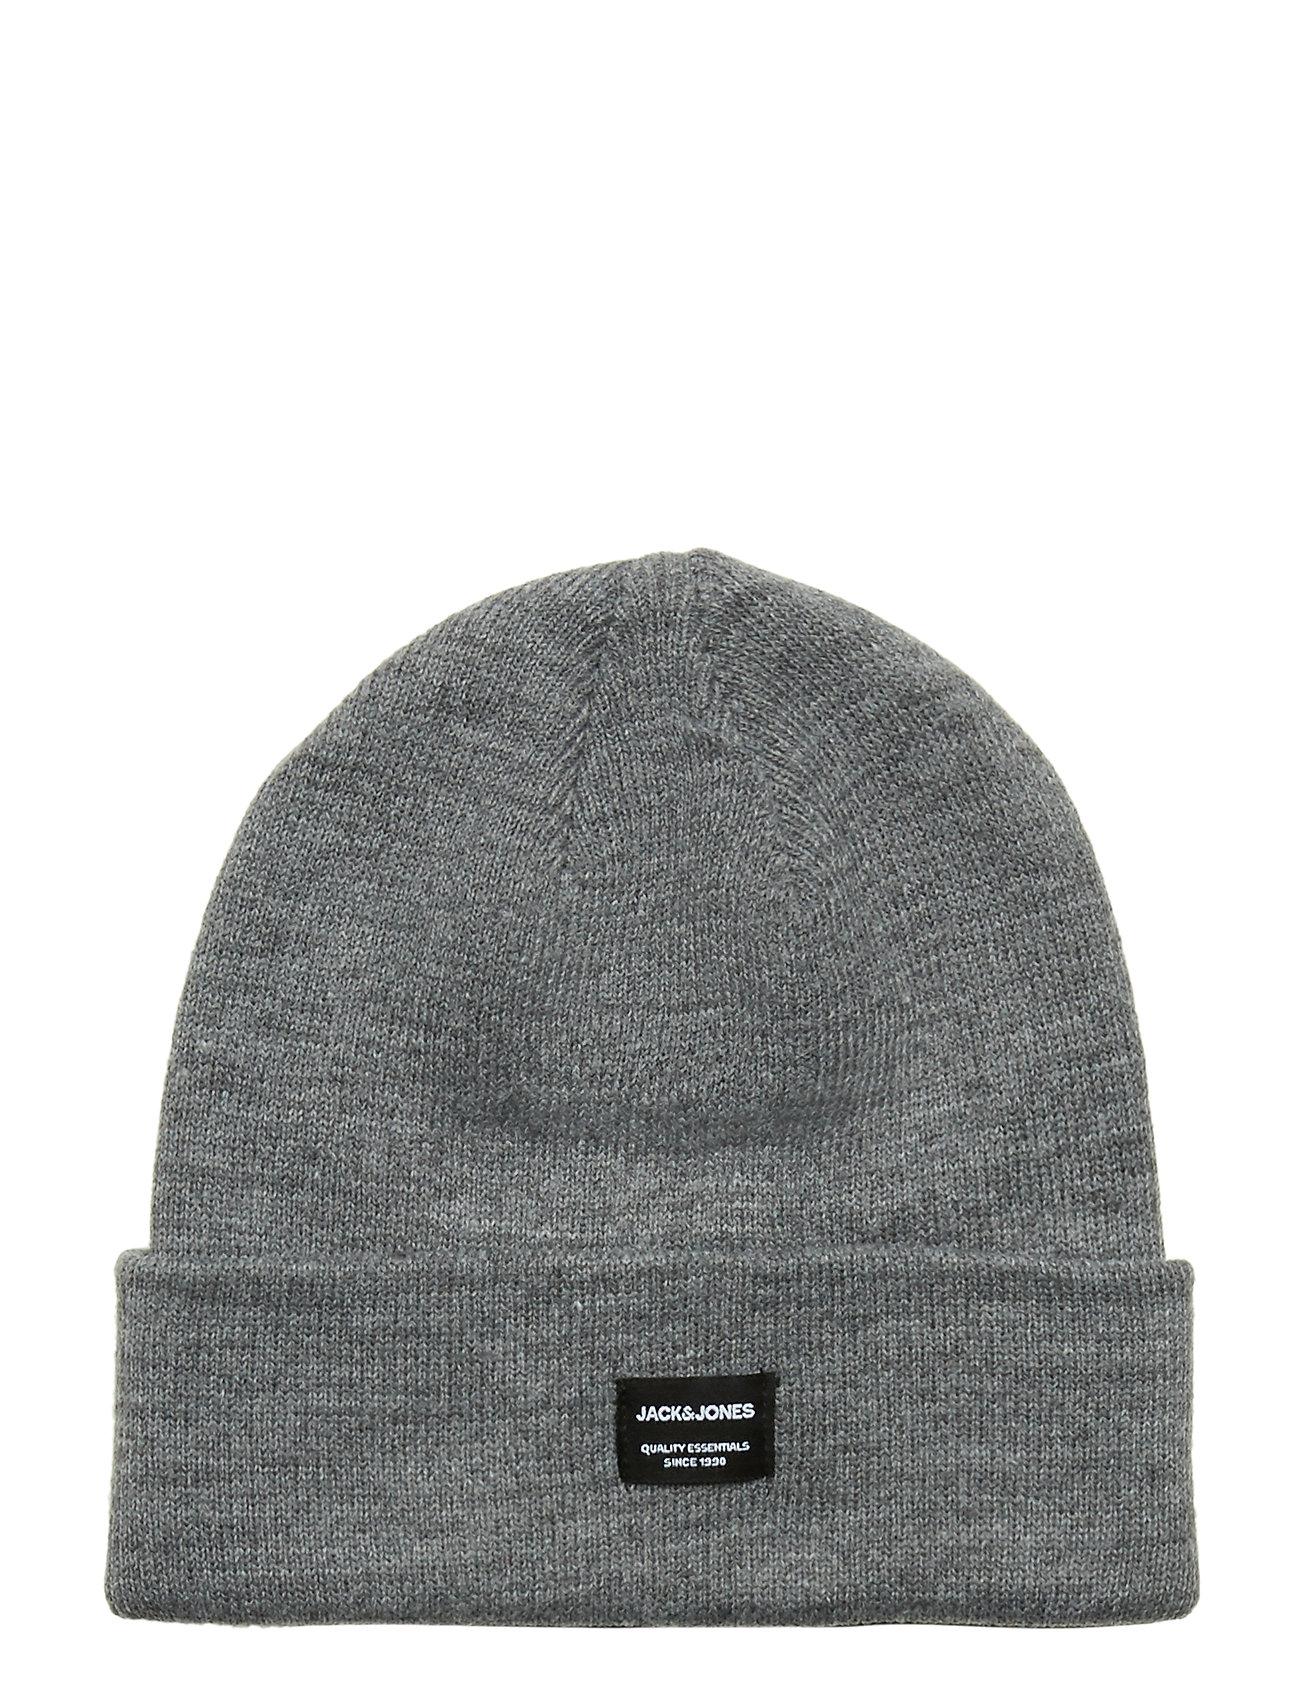 Image of Jacdna Beanie Noos Accessories Hats & Caps Beanies Grå Jack & J S (3213733547)